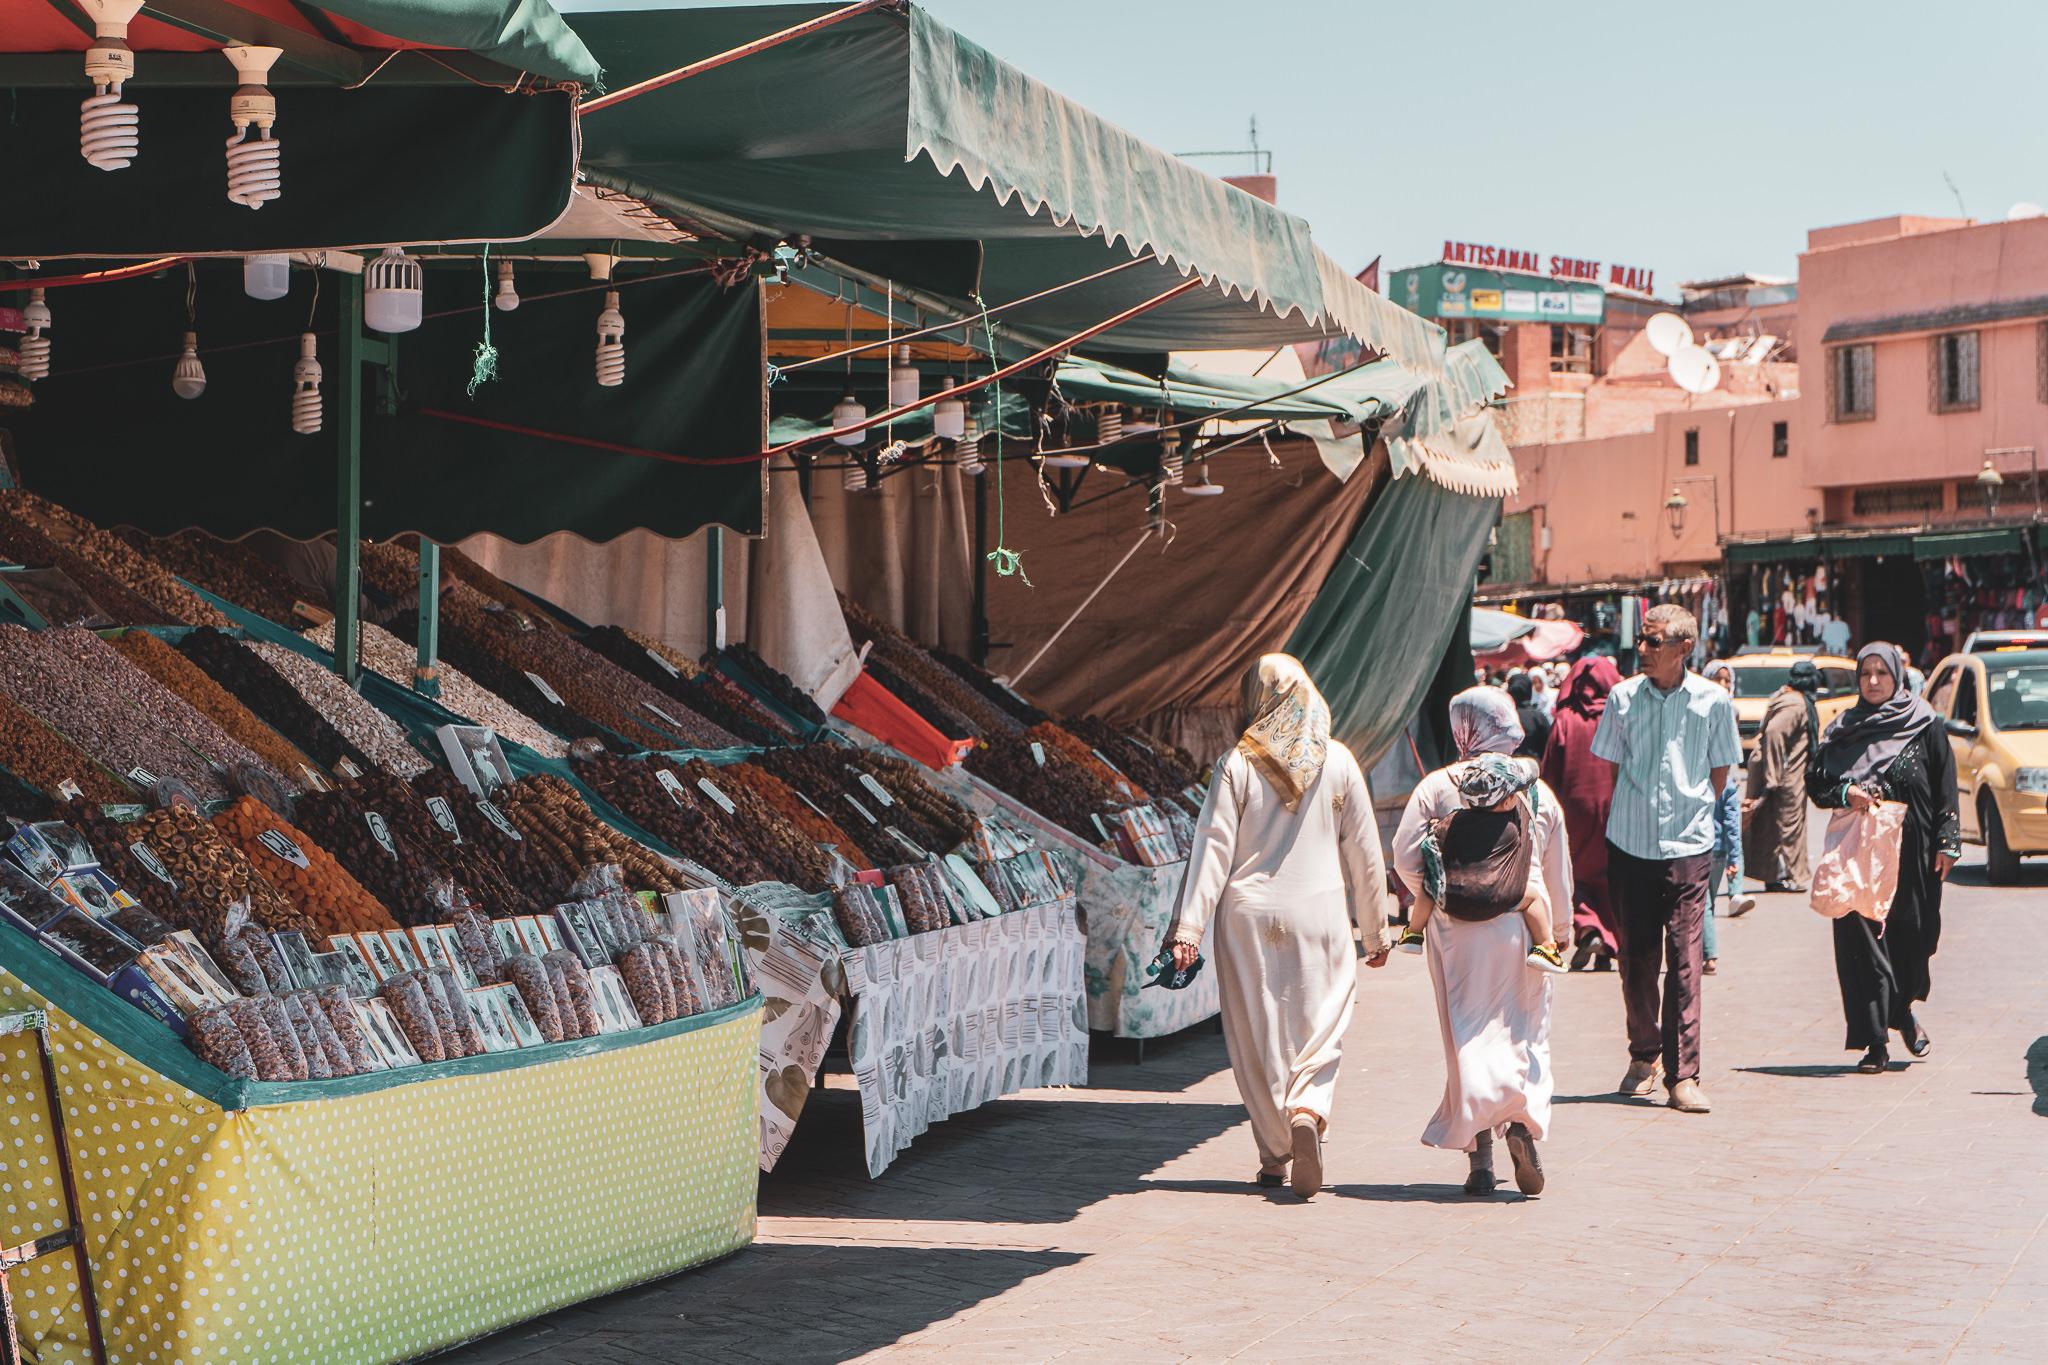 Marrakesh Street Vendors – Fruits